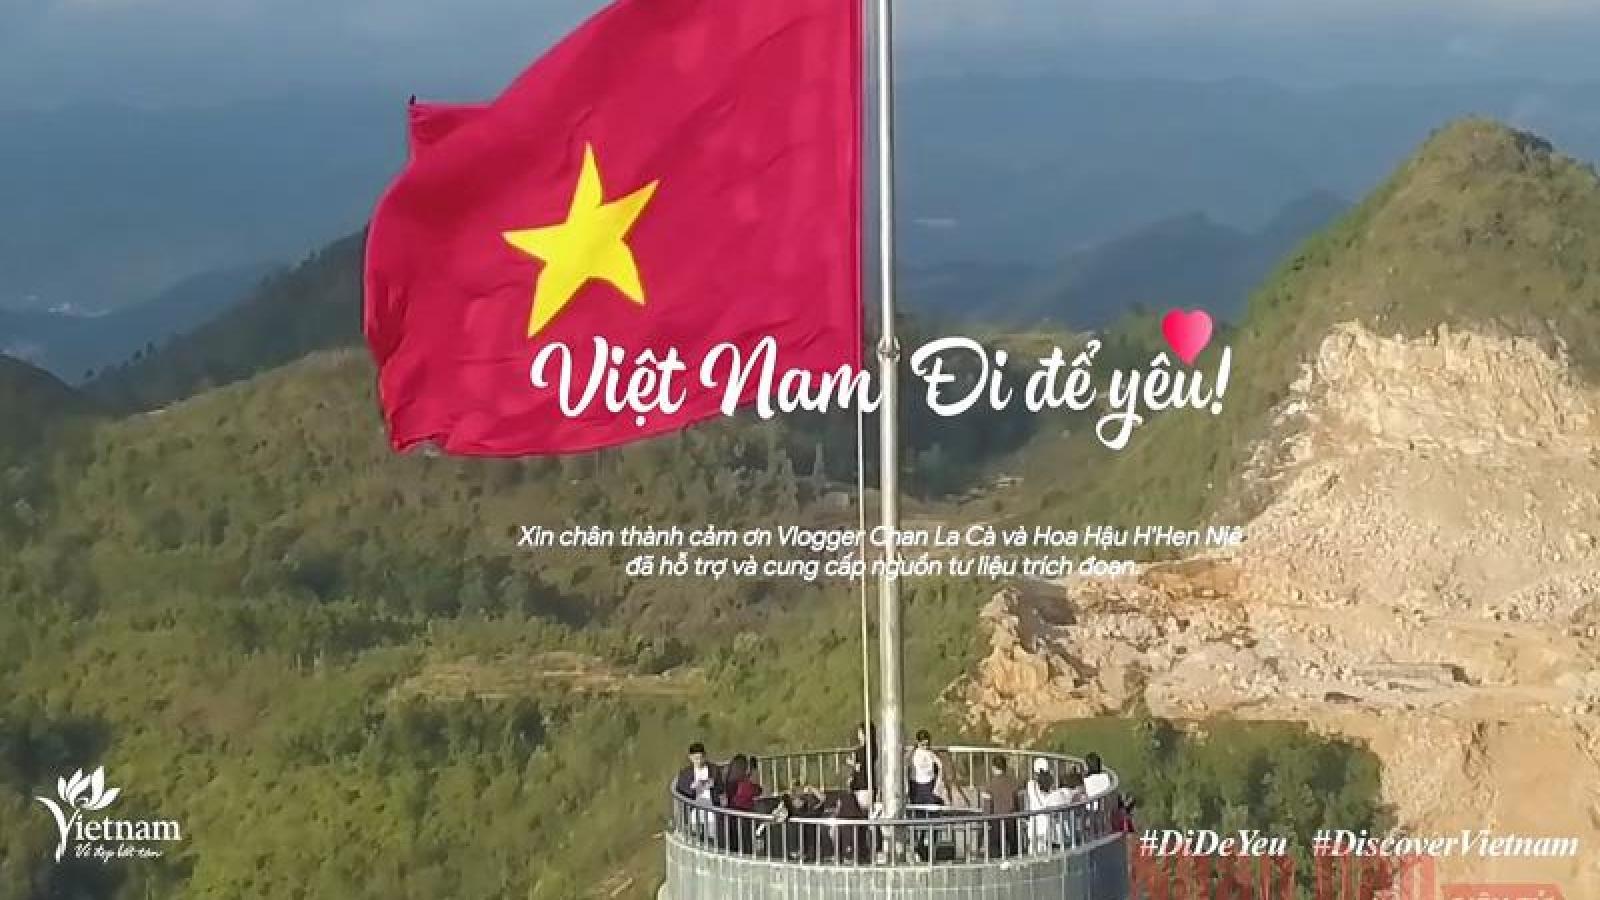 Vietnamese tourism clip passes one million views on YouTube